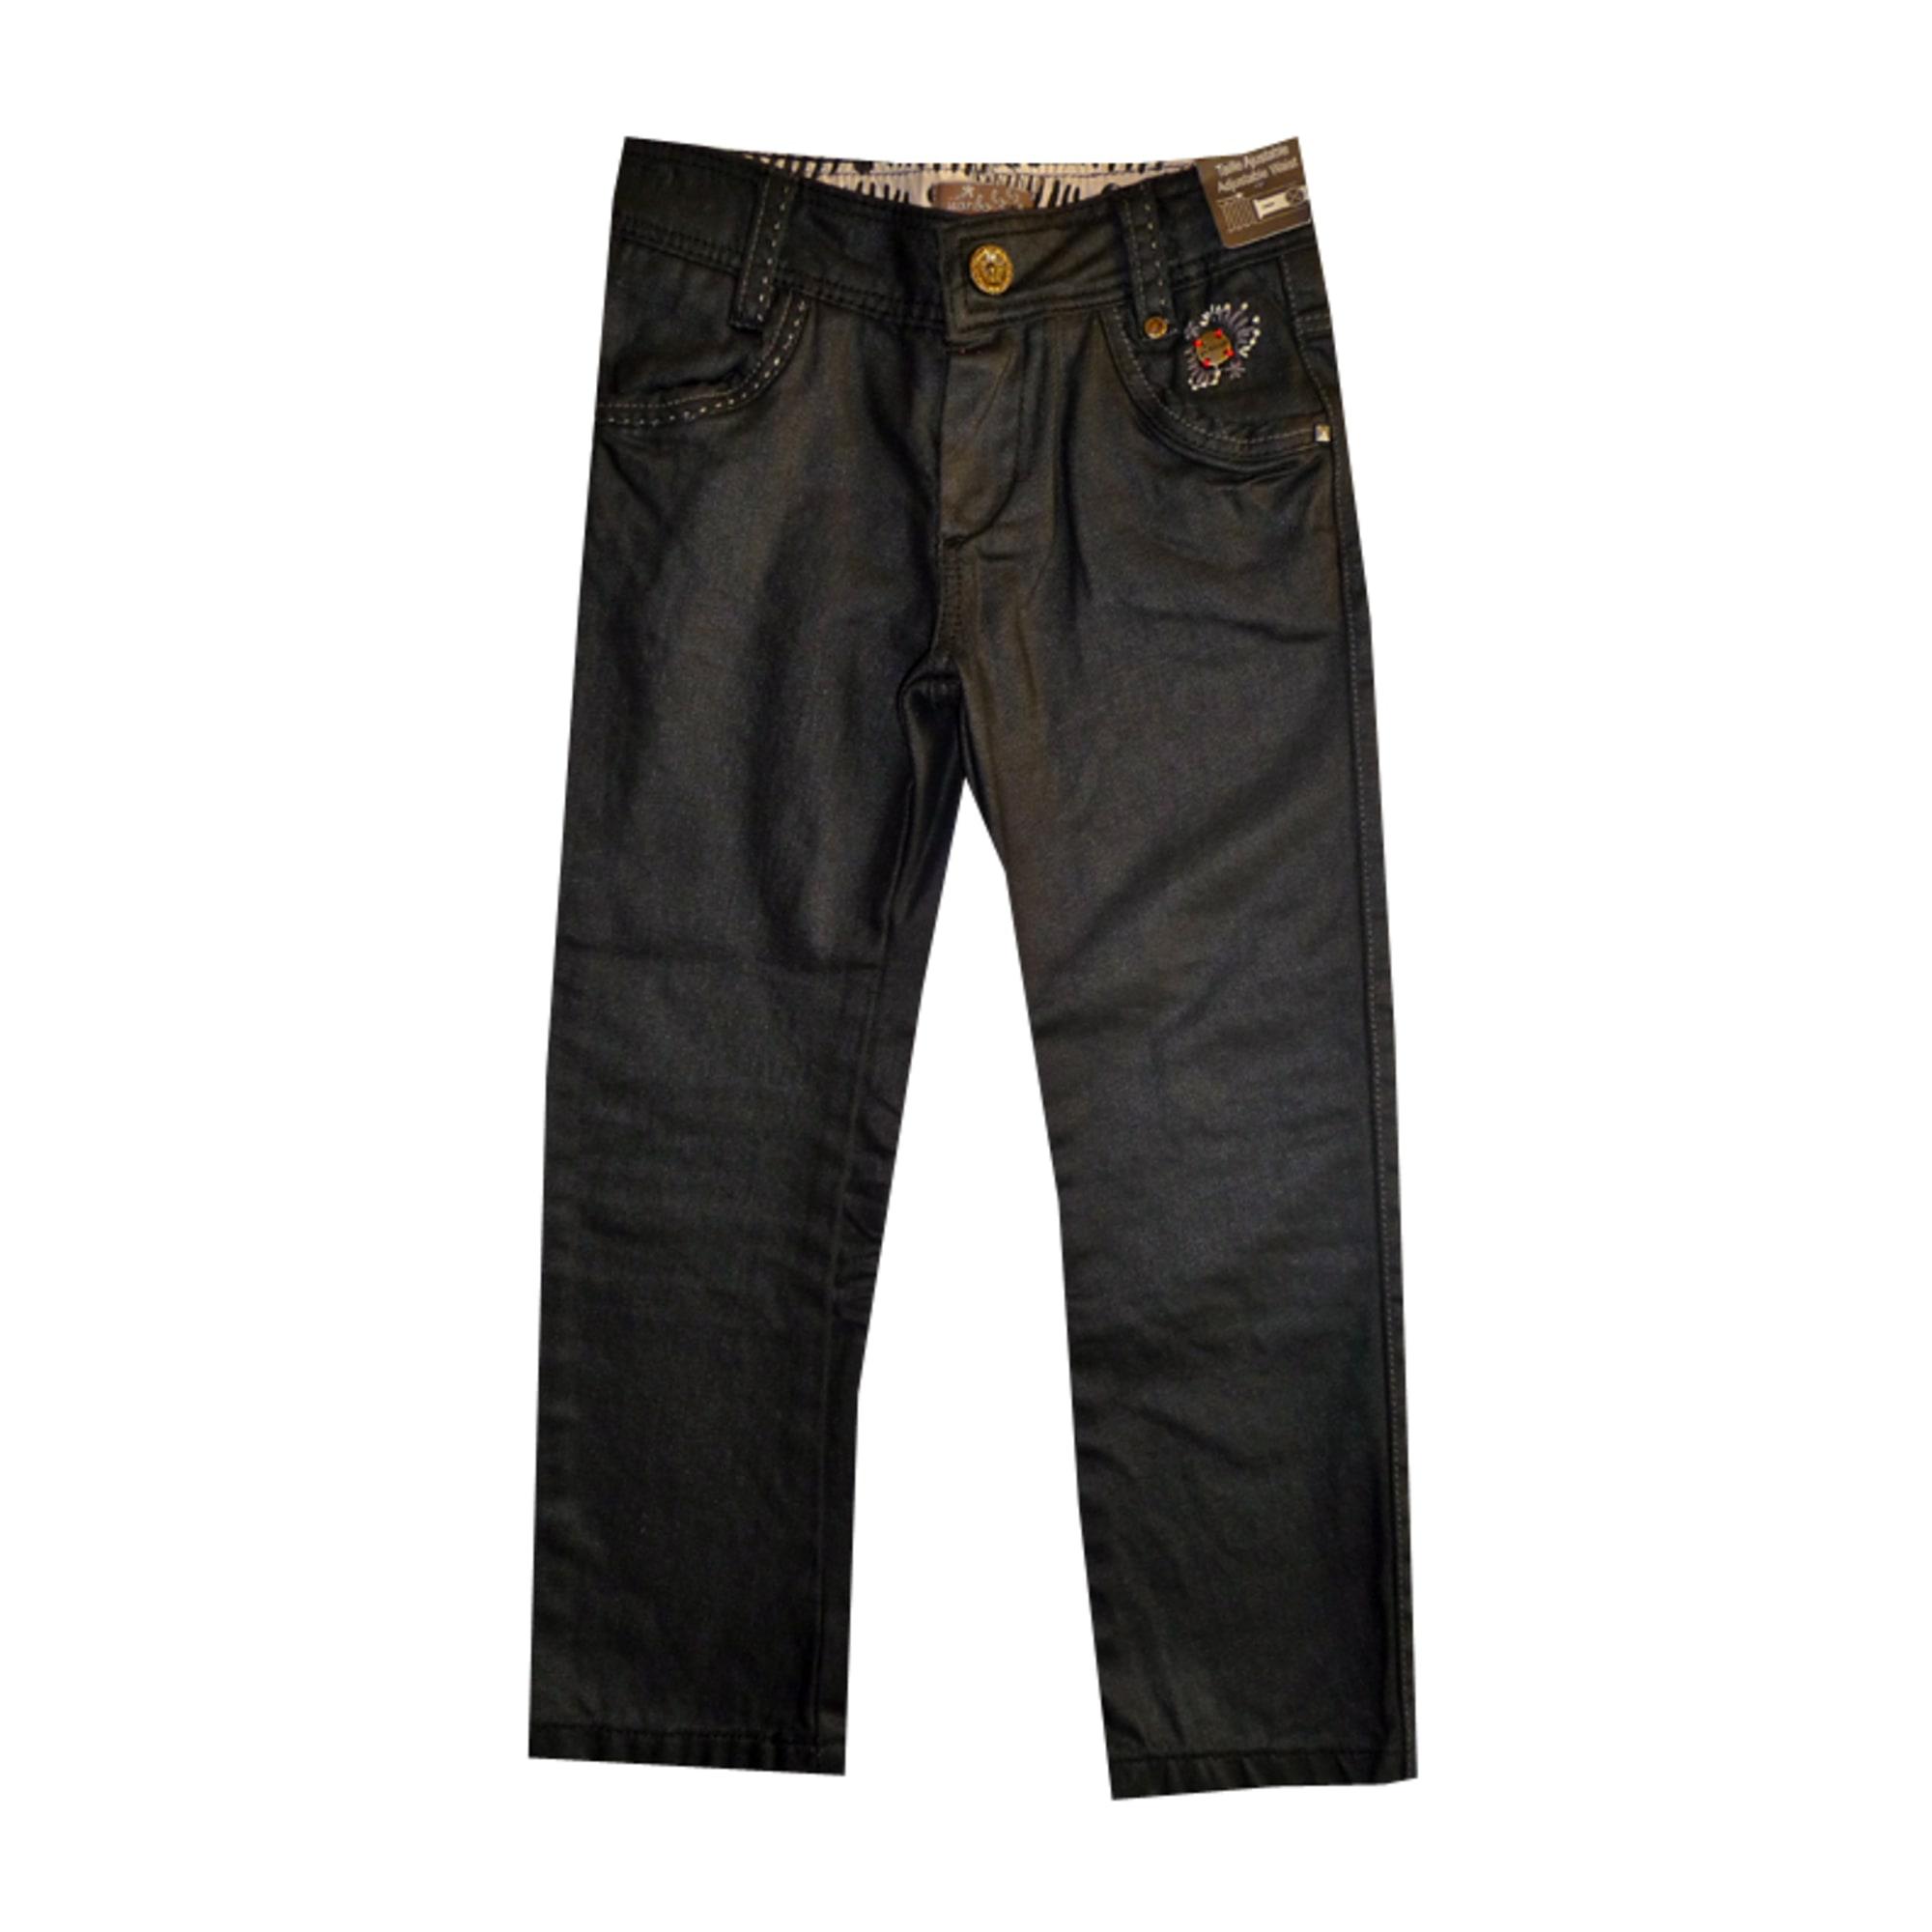 2d06bfd82f405 Pantalon JEAN BOURGET 5-6 ans noir - 1040848